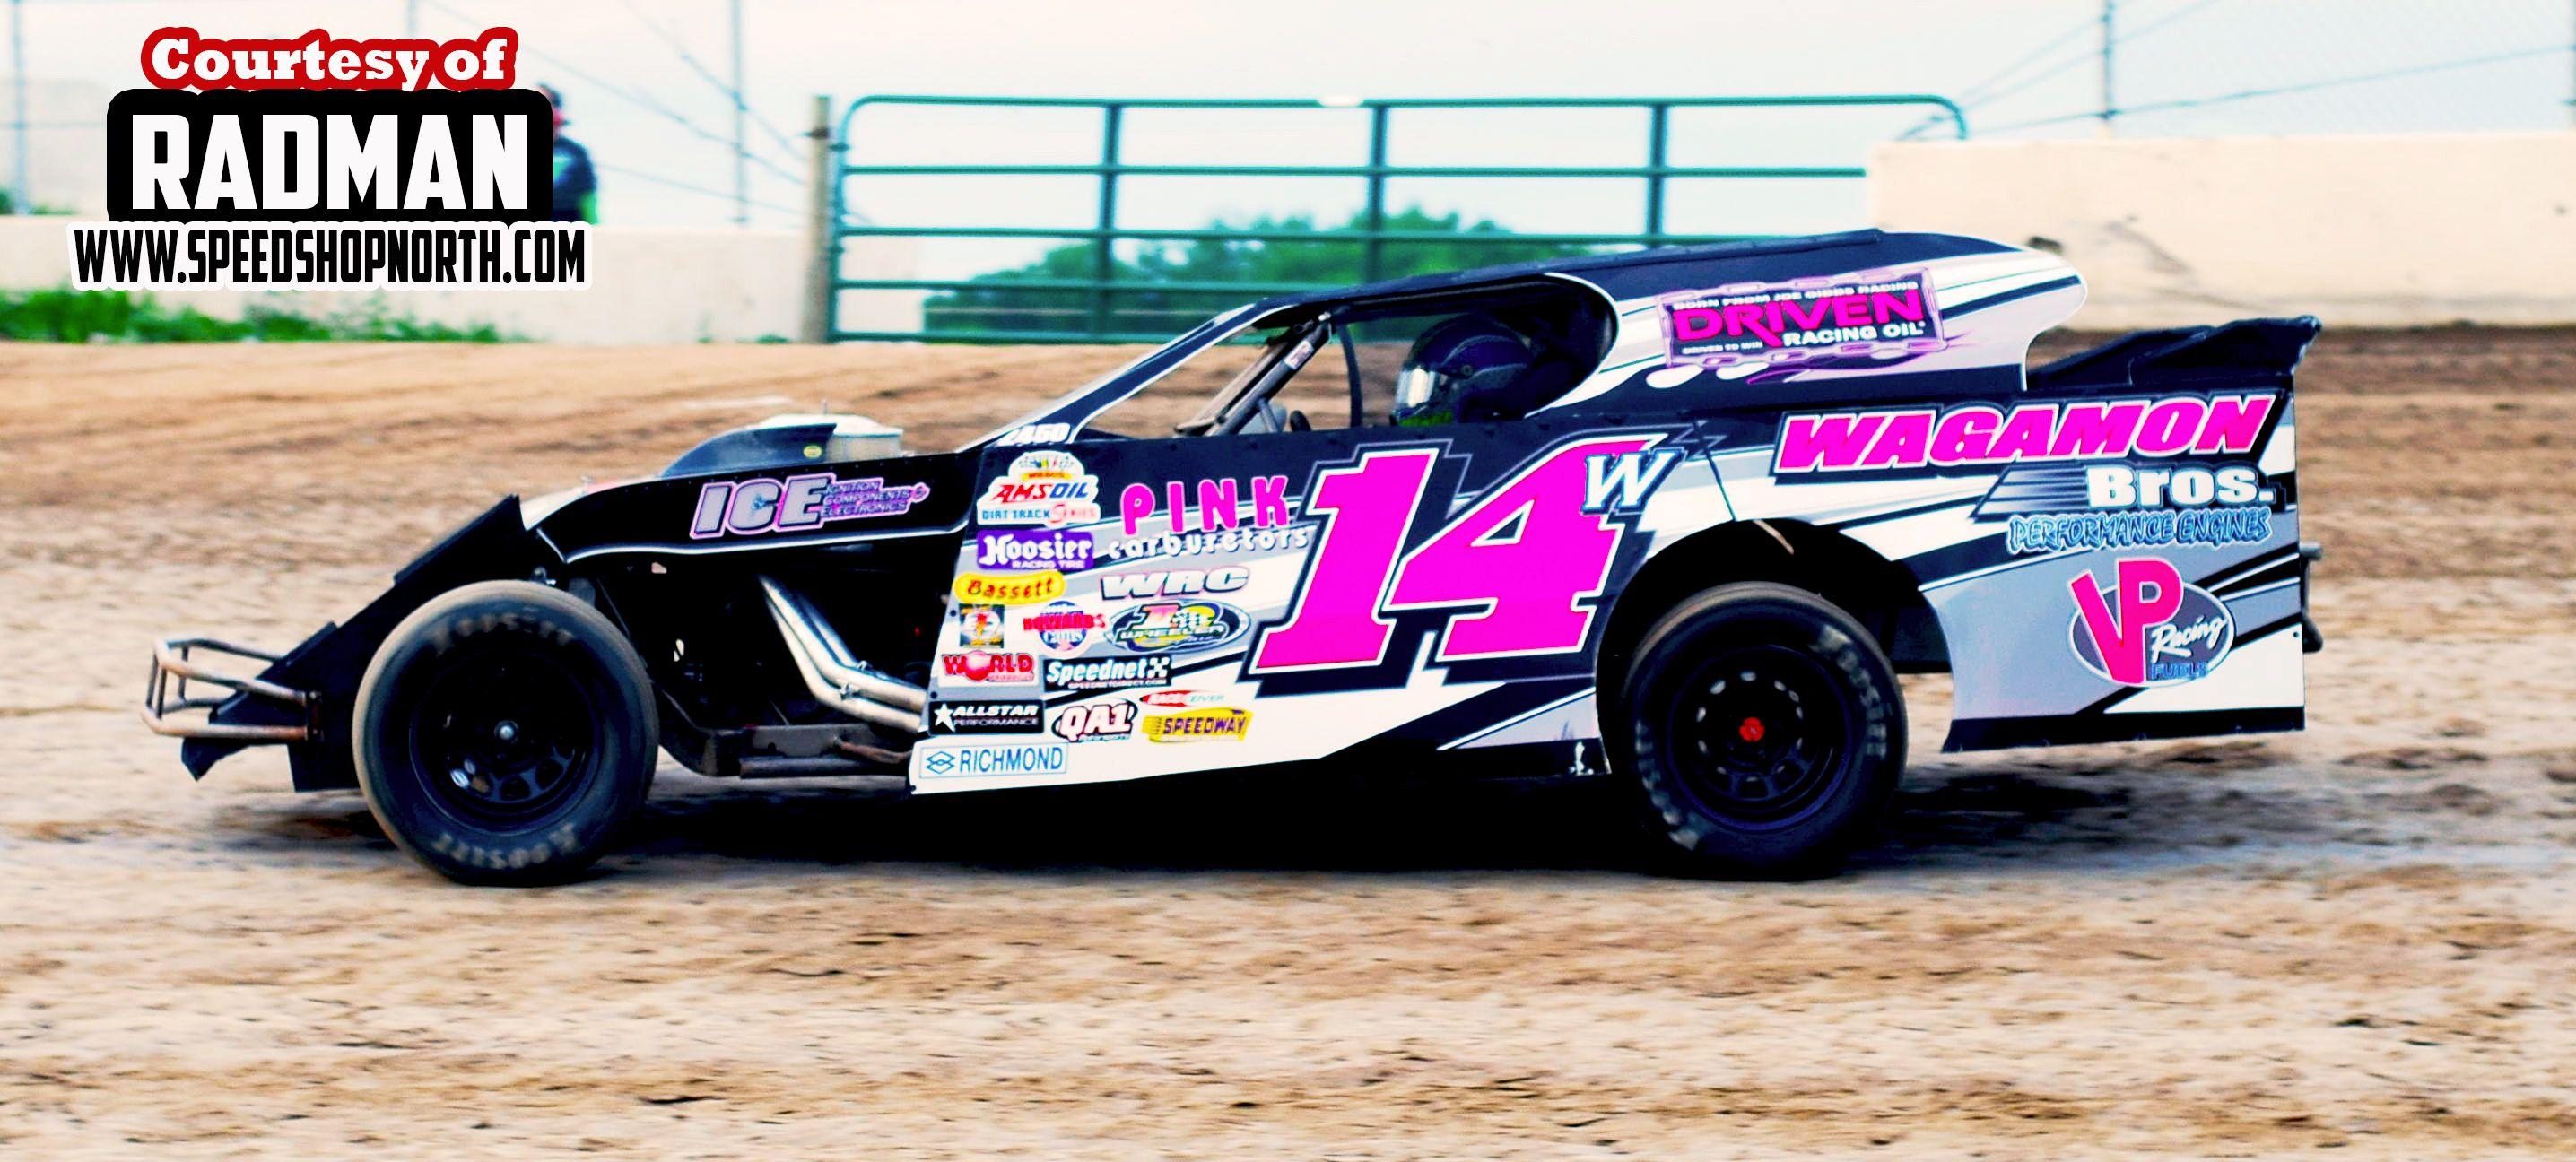 Clayton Wagamon Wissota Modified Dirt Track Race Car Dirt Track Cars Dirt Track Racing Dirt Track